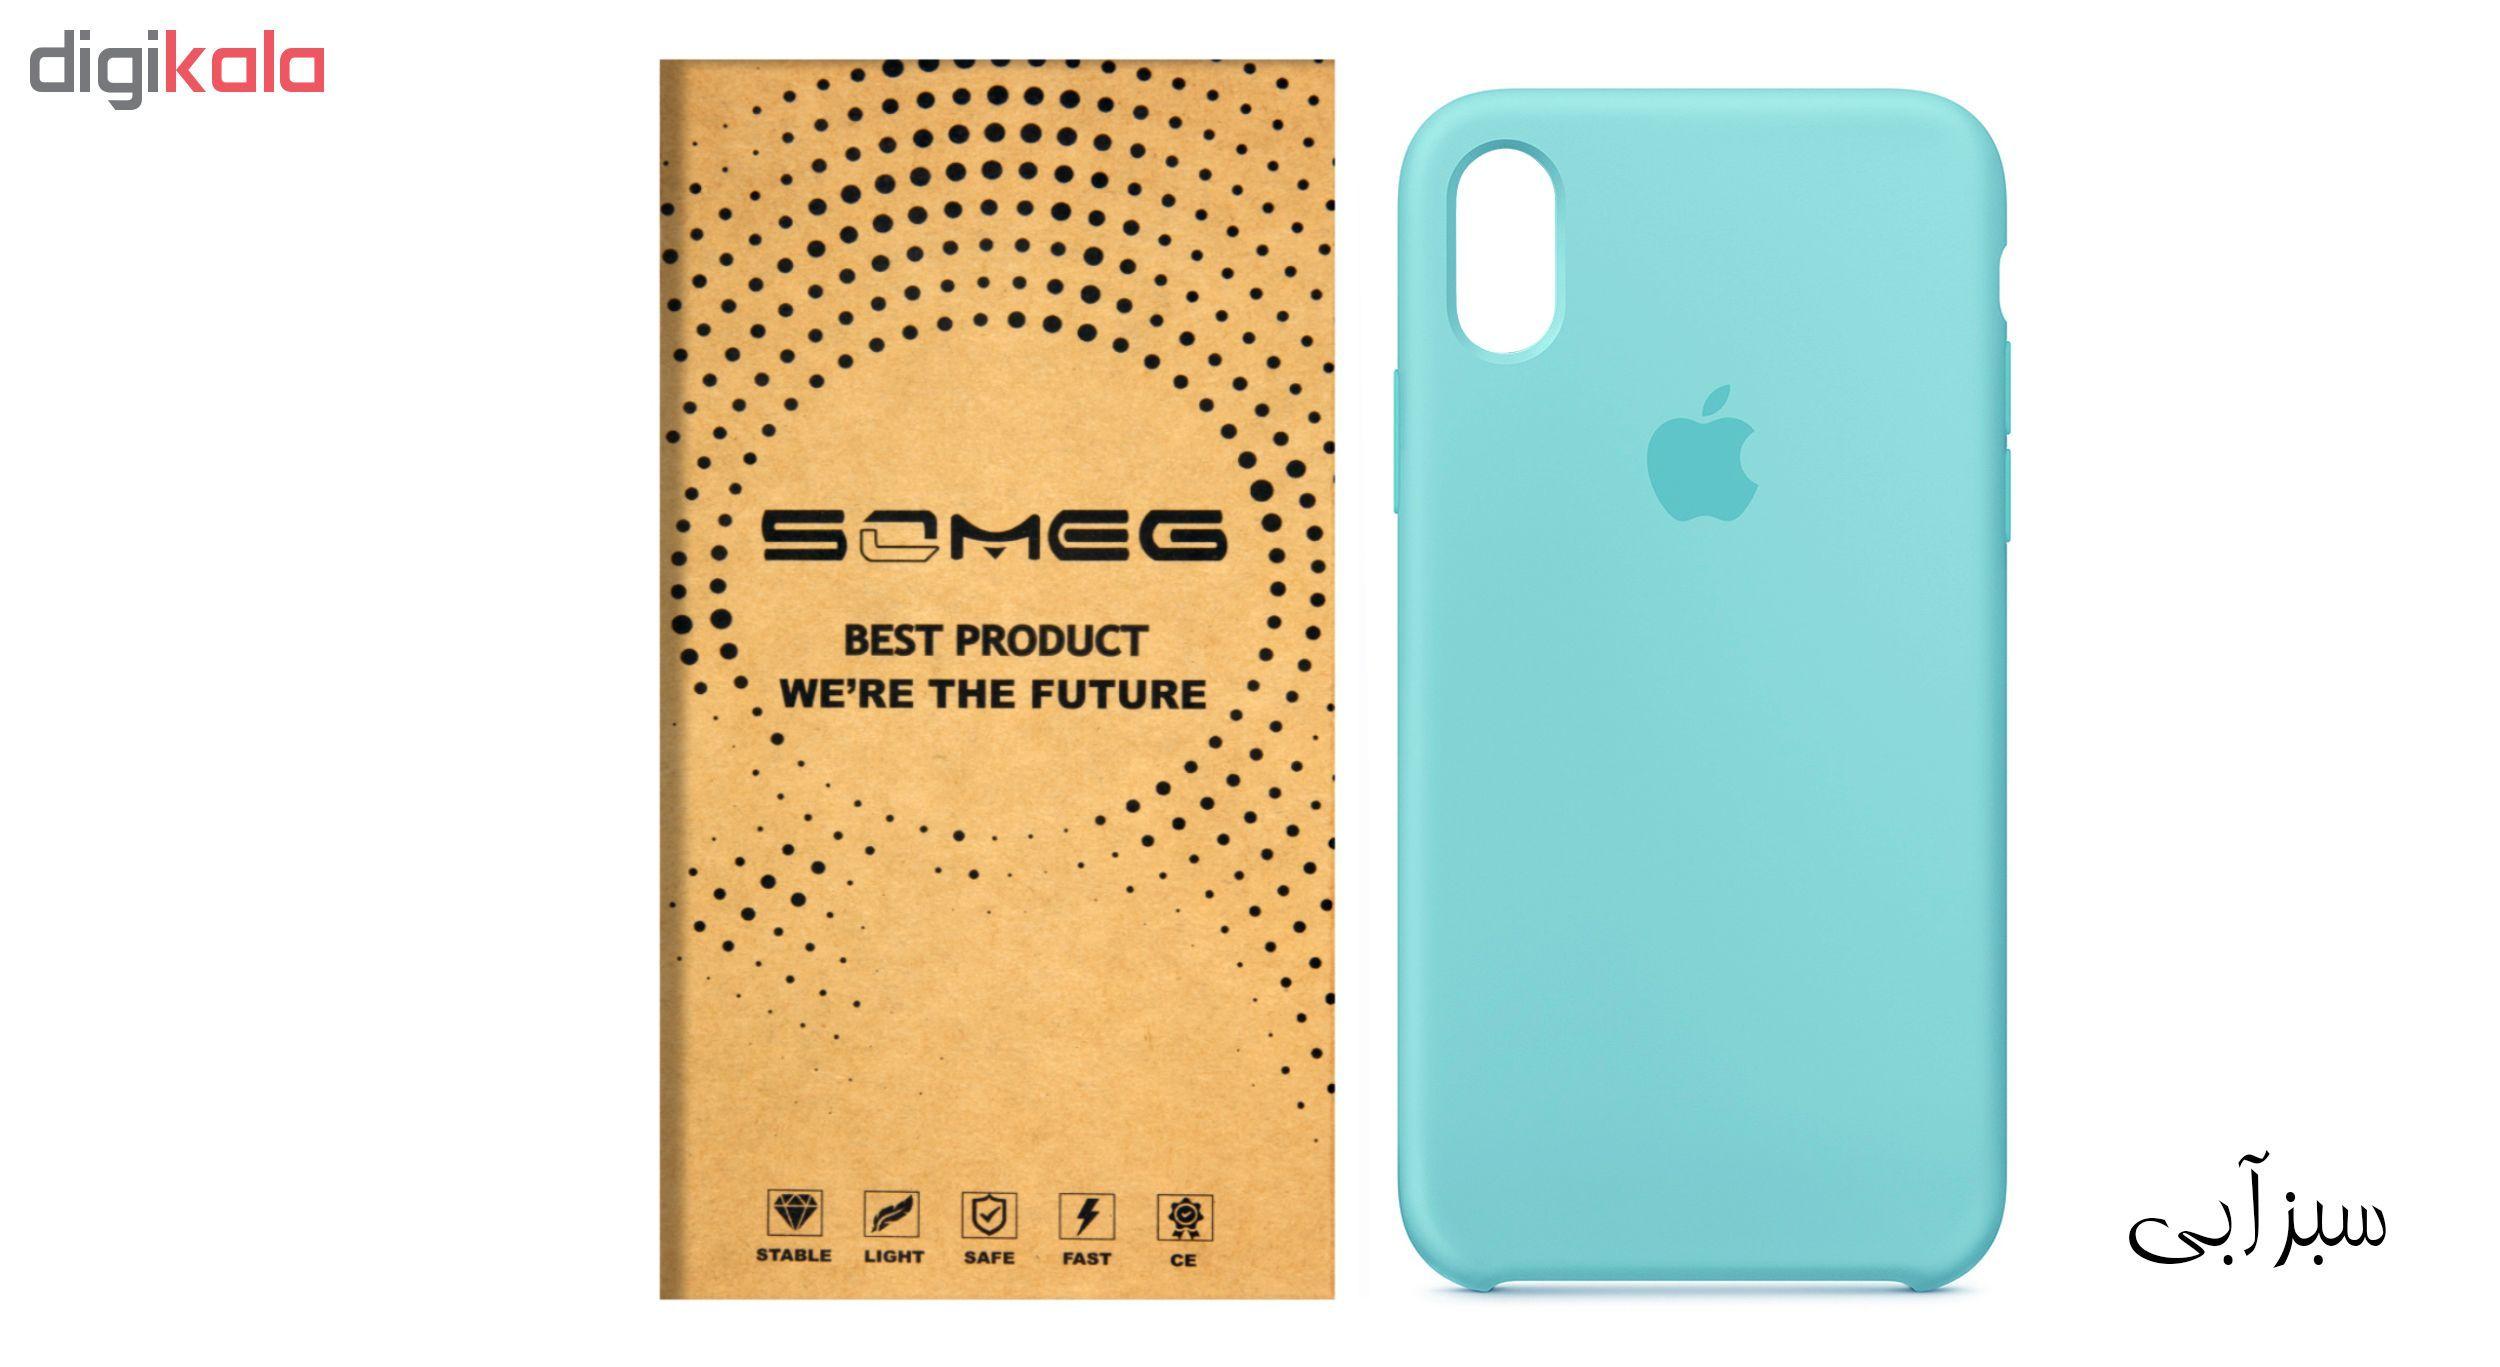 کاور سومگ مدل SIC مناسب برای گوشی موبایل اپل iPhone X  main 1 10